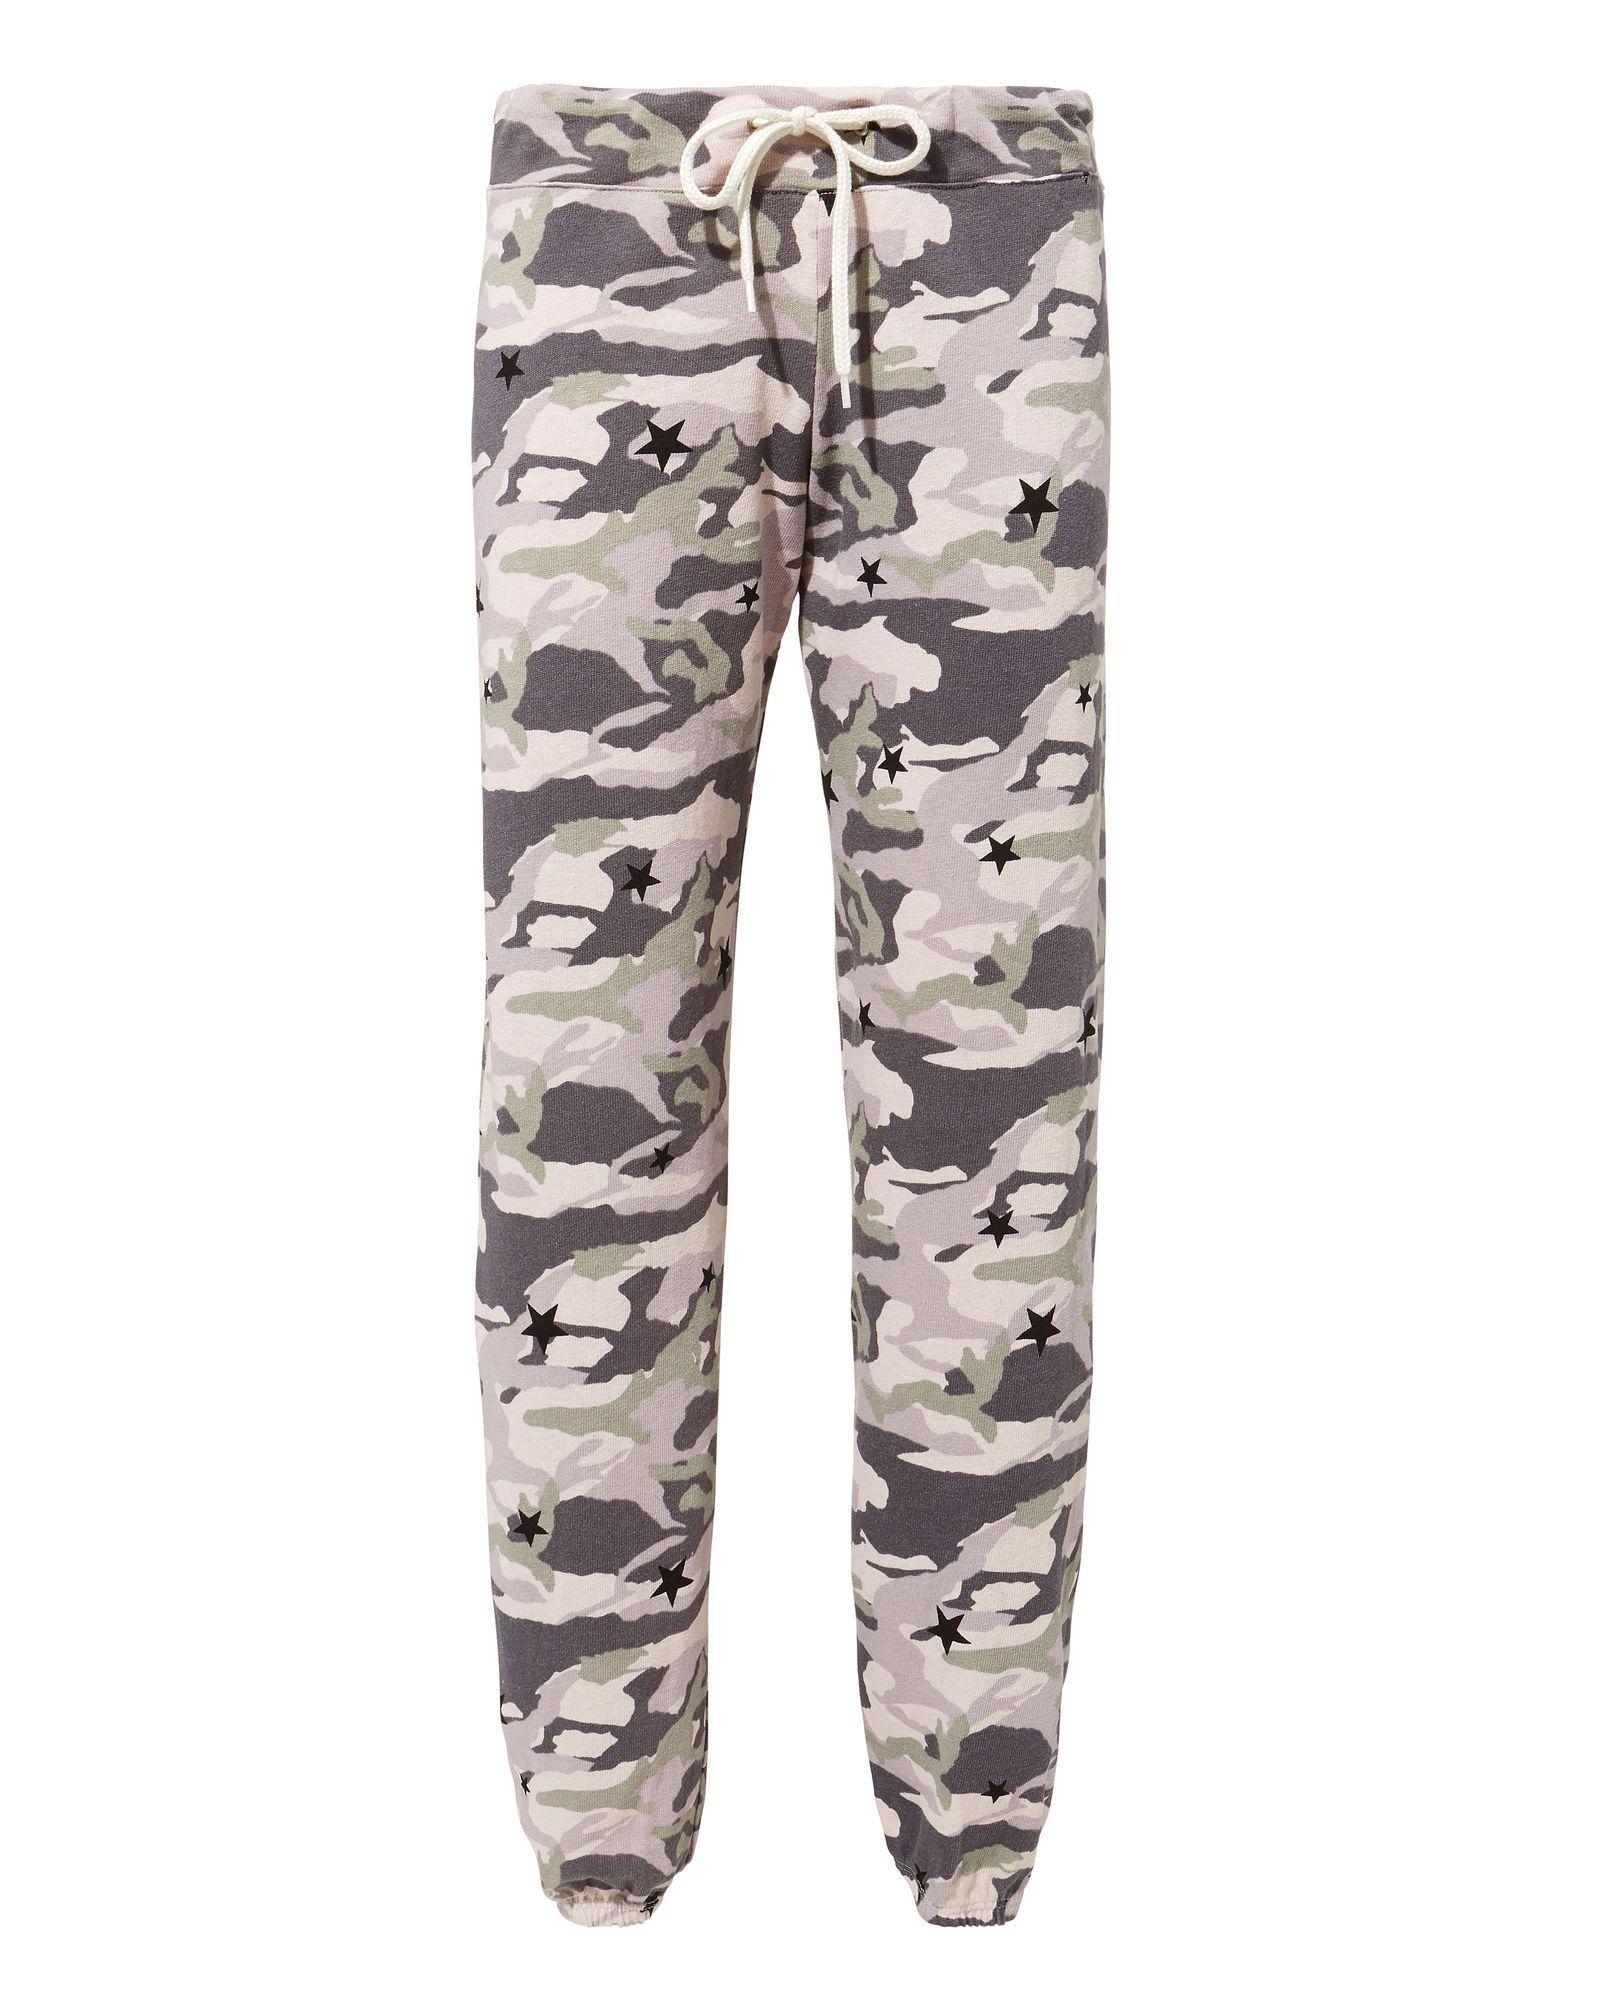 bf415176 MONROW . #monrow #cloth # | Monrow in 2019 | Sweatpants, Pajama ...